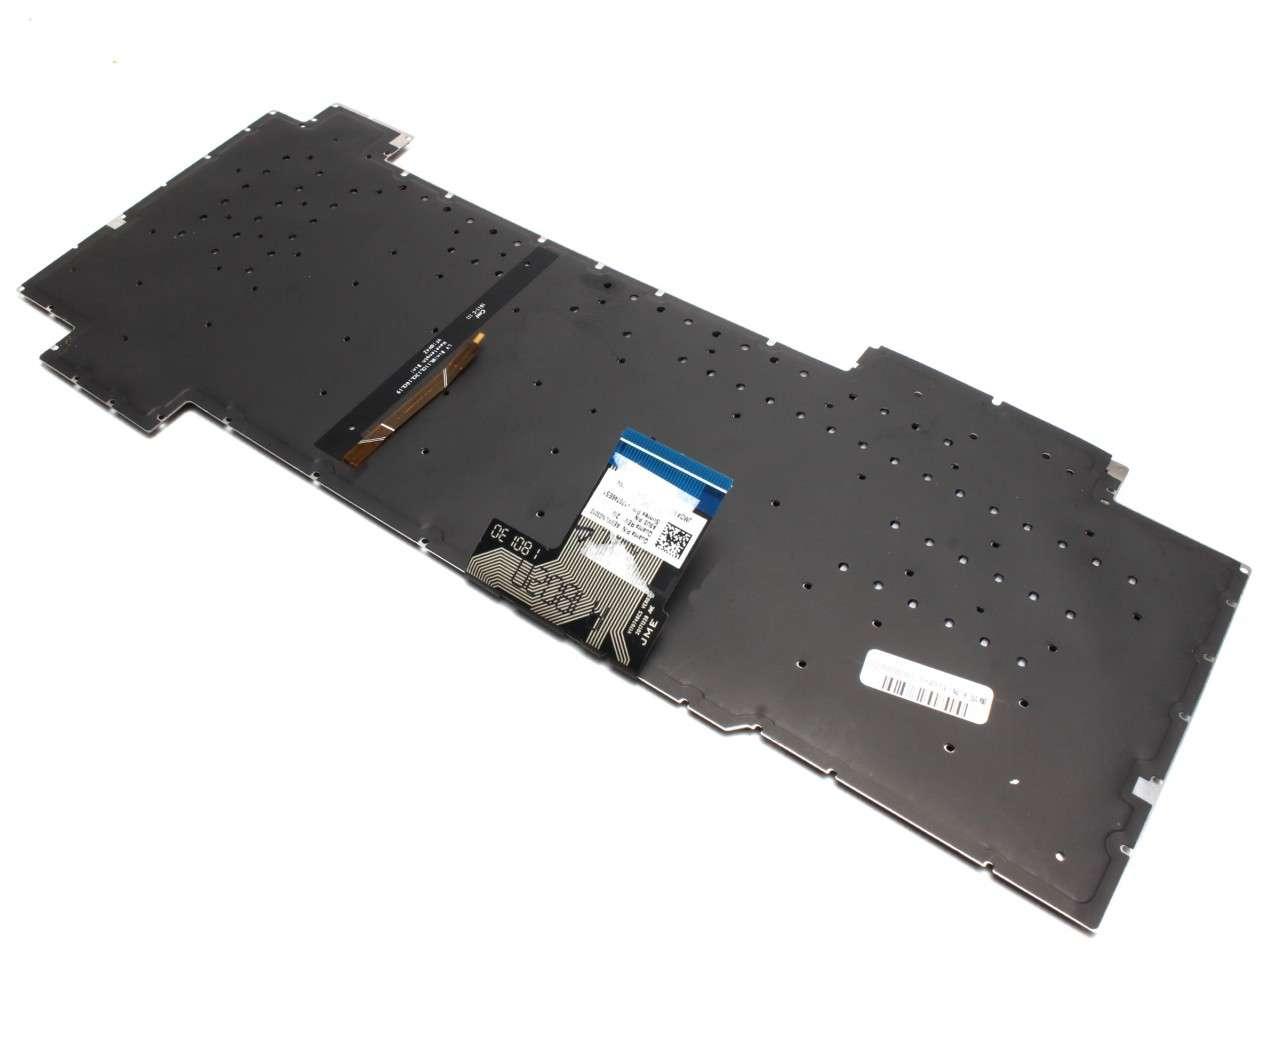 Tastatura neagra cu iluminare rosie pe marginea tastelor Asus TUF Gaming FX80GD iluminata layout US fara rama enter mic imagine powerlaptop.ro 2021